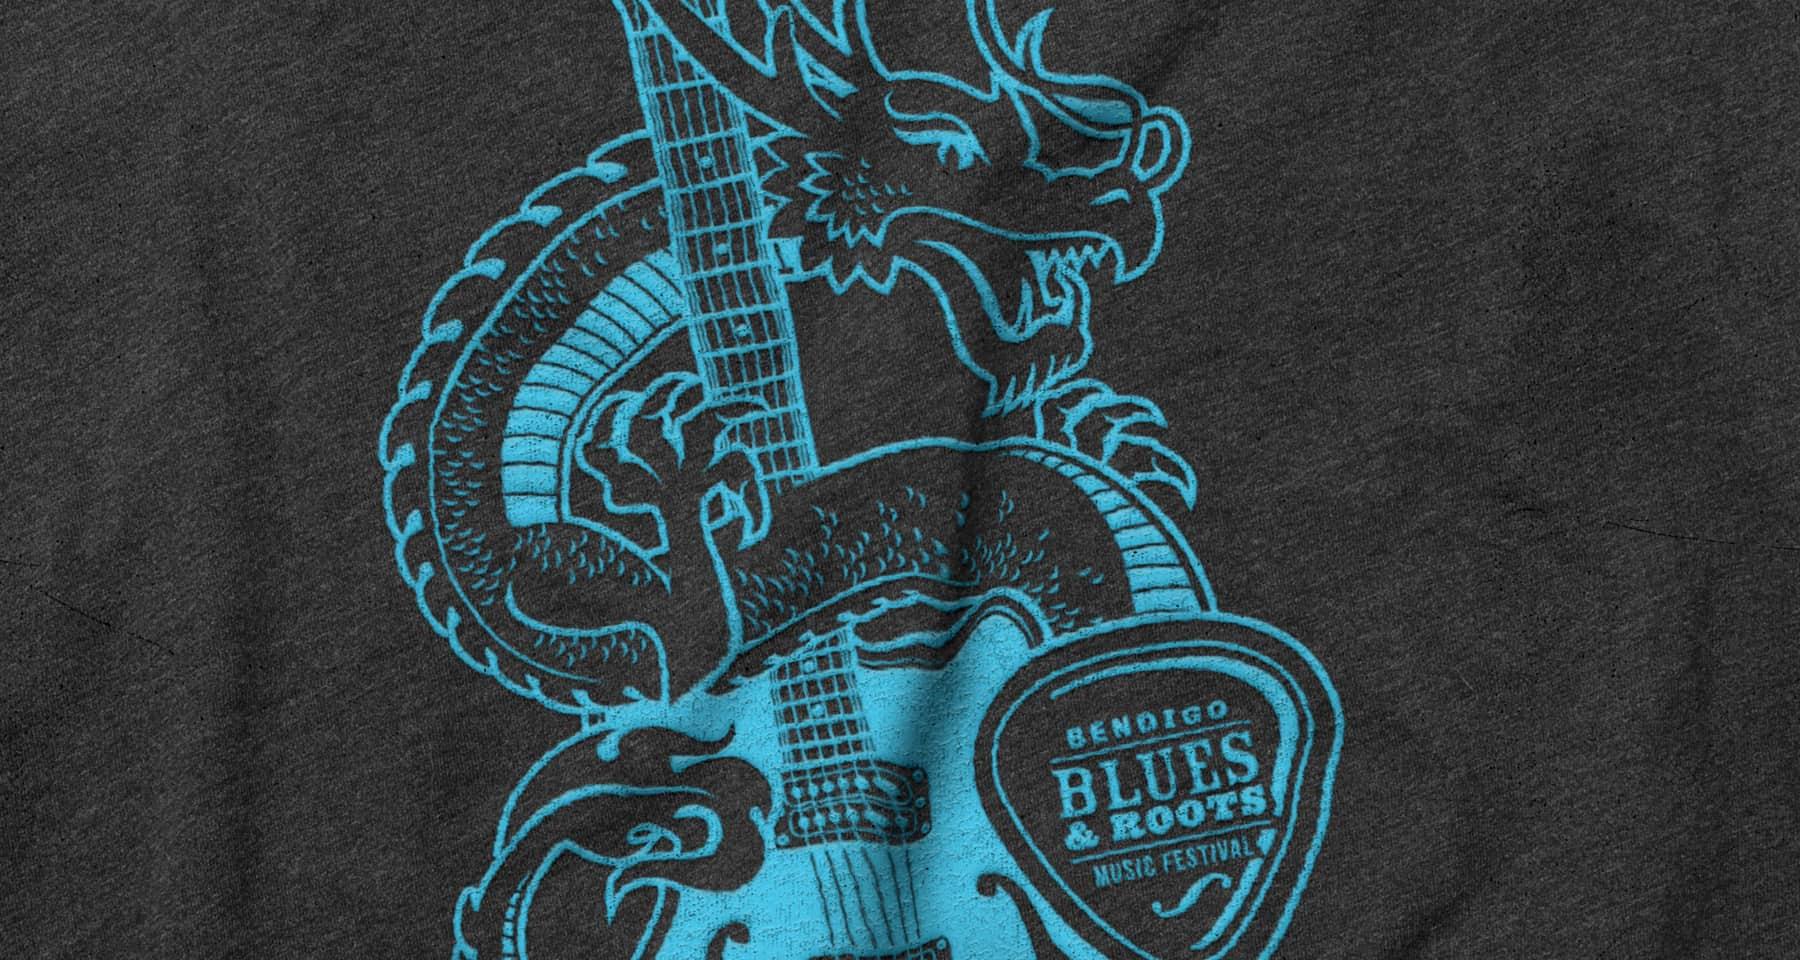 Bendigo Blues & Roots Music Festival Merchandise